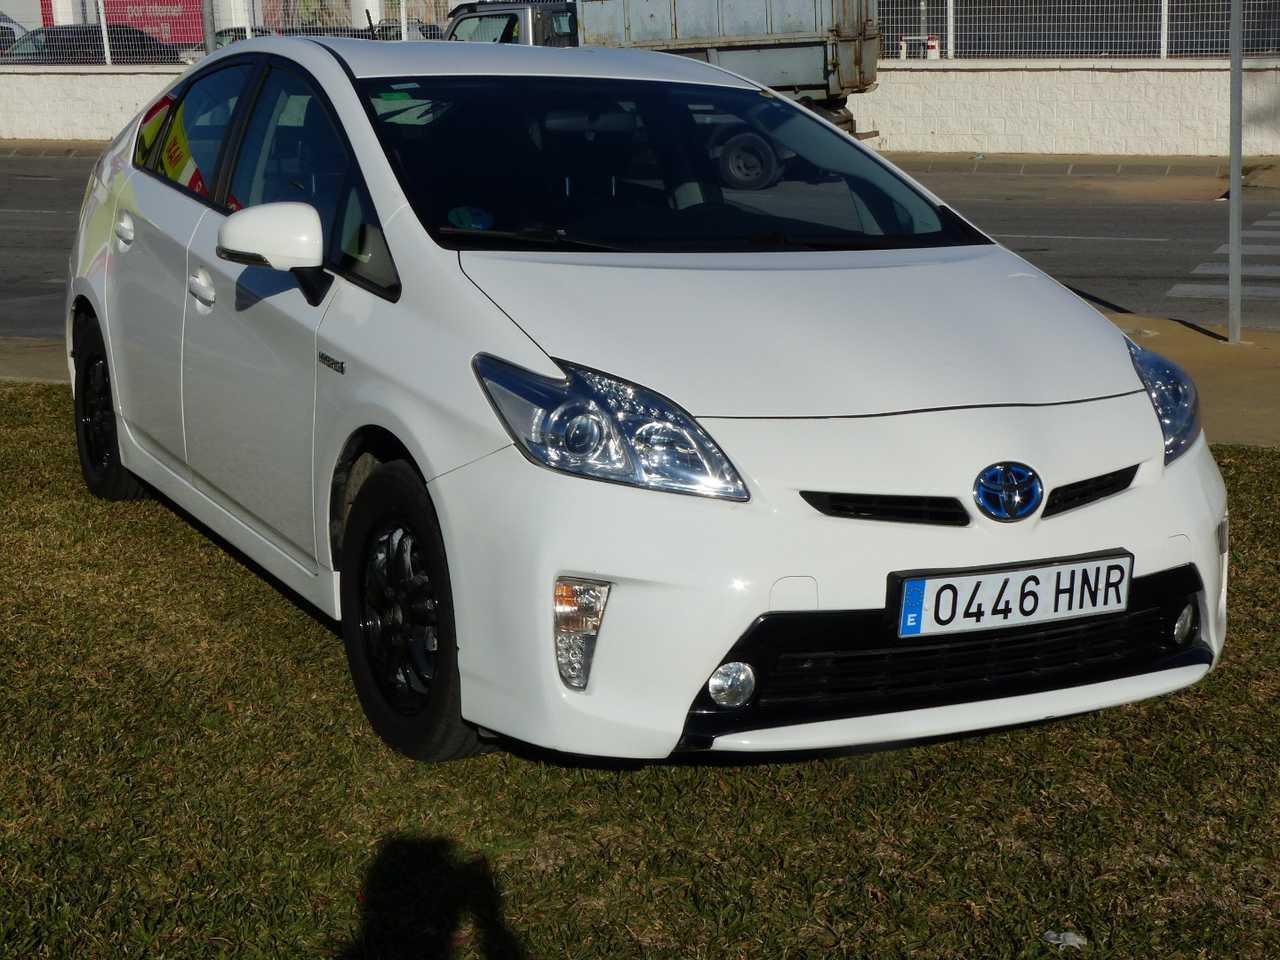 Toyota Prius 1.8 hibrido advance automatico 138 cv 2013 km certificados   - Foto 1